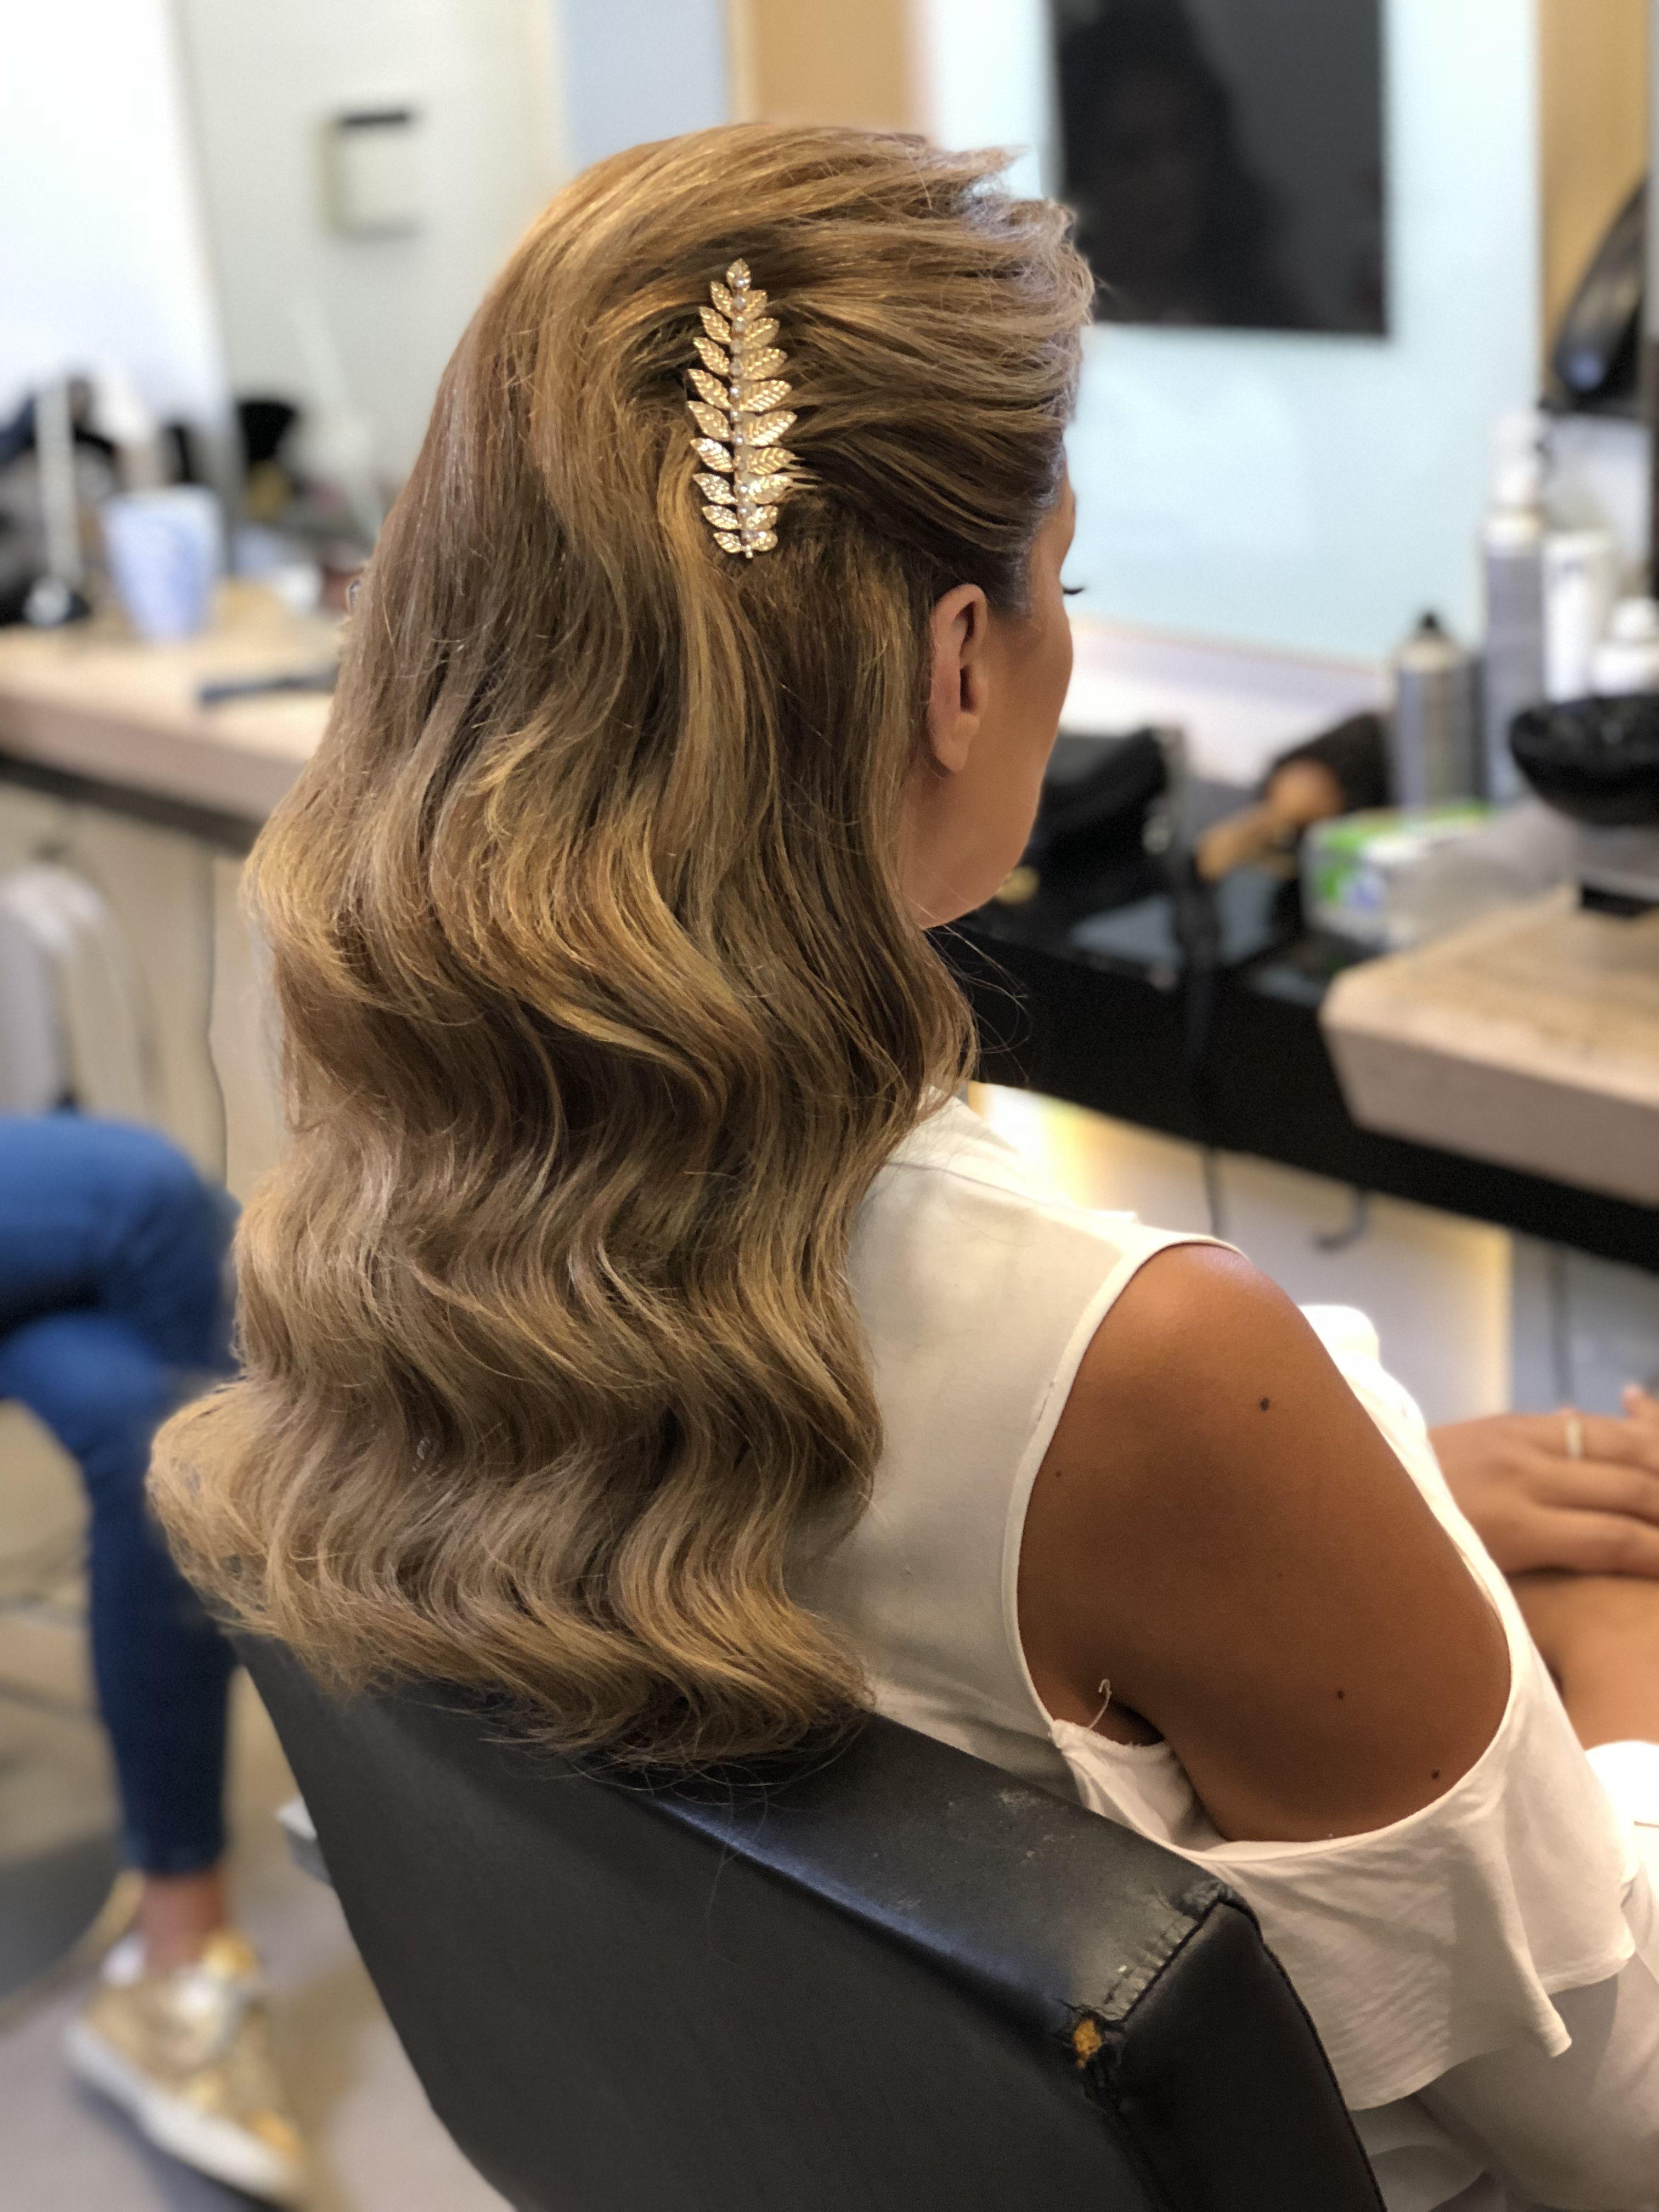 Lebanon Hair Hairstyle Haircut Hairfashion Haircolor Shorthair Ombrehair Beauty Supernatural Party Love Hair Styles Gorgeous Hair Best Hair Salon